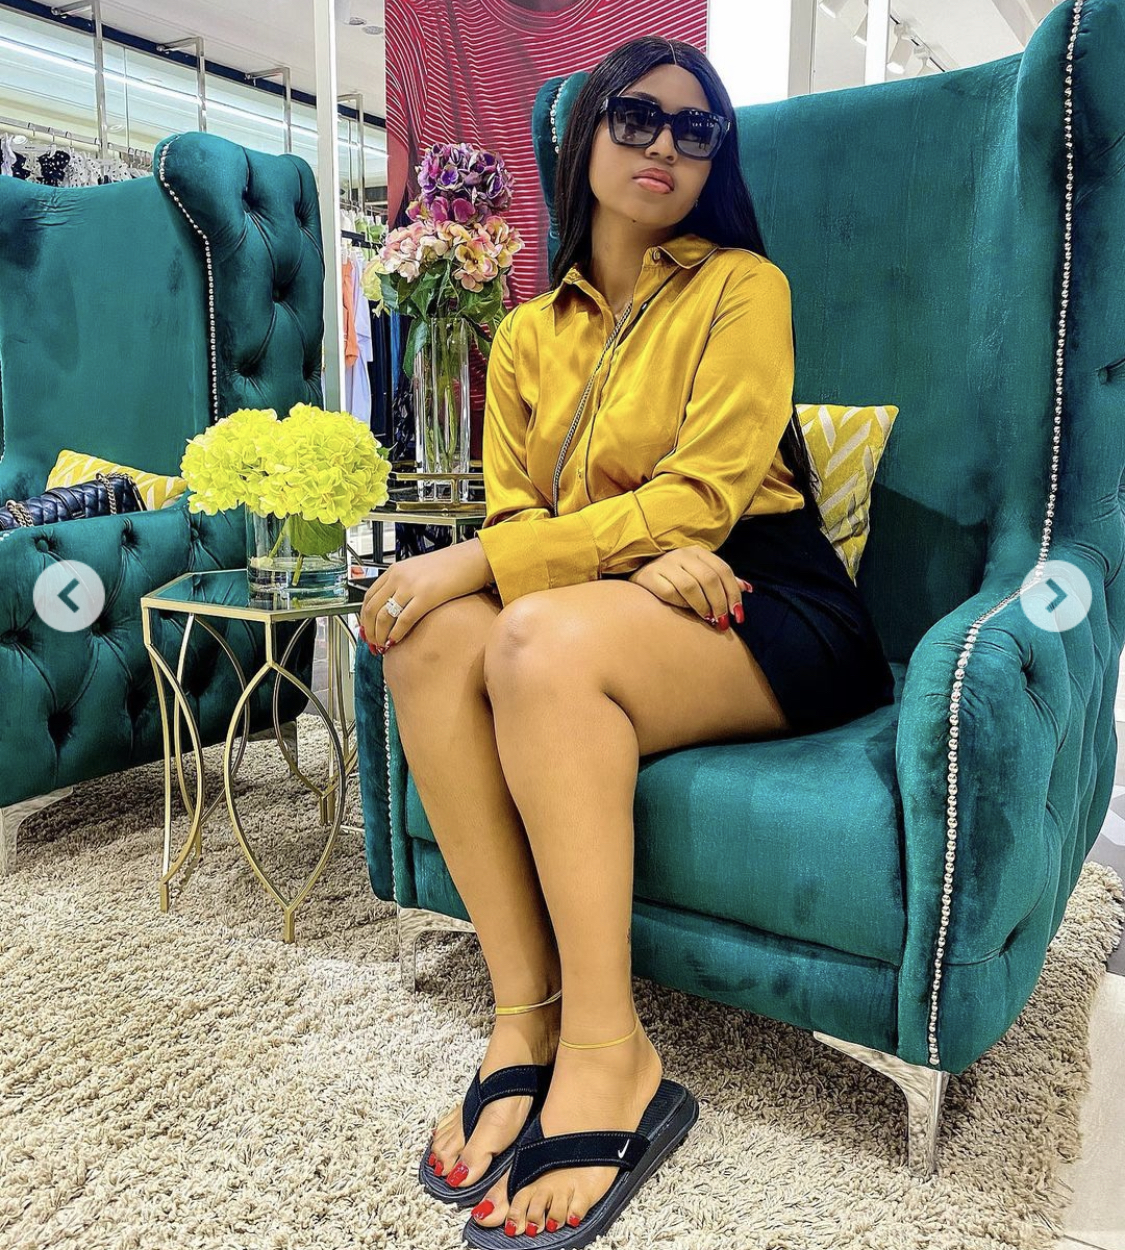 Regina Daniels Shares Stunning Photos On Instagram